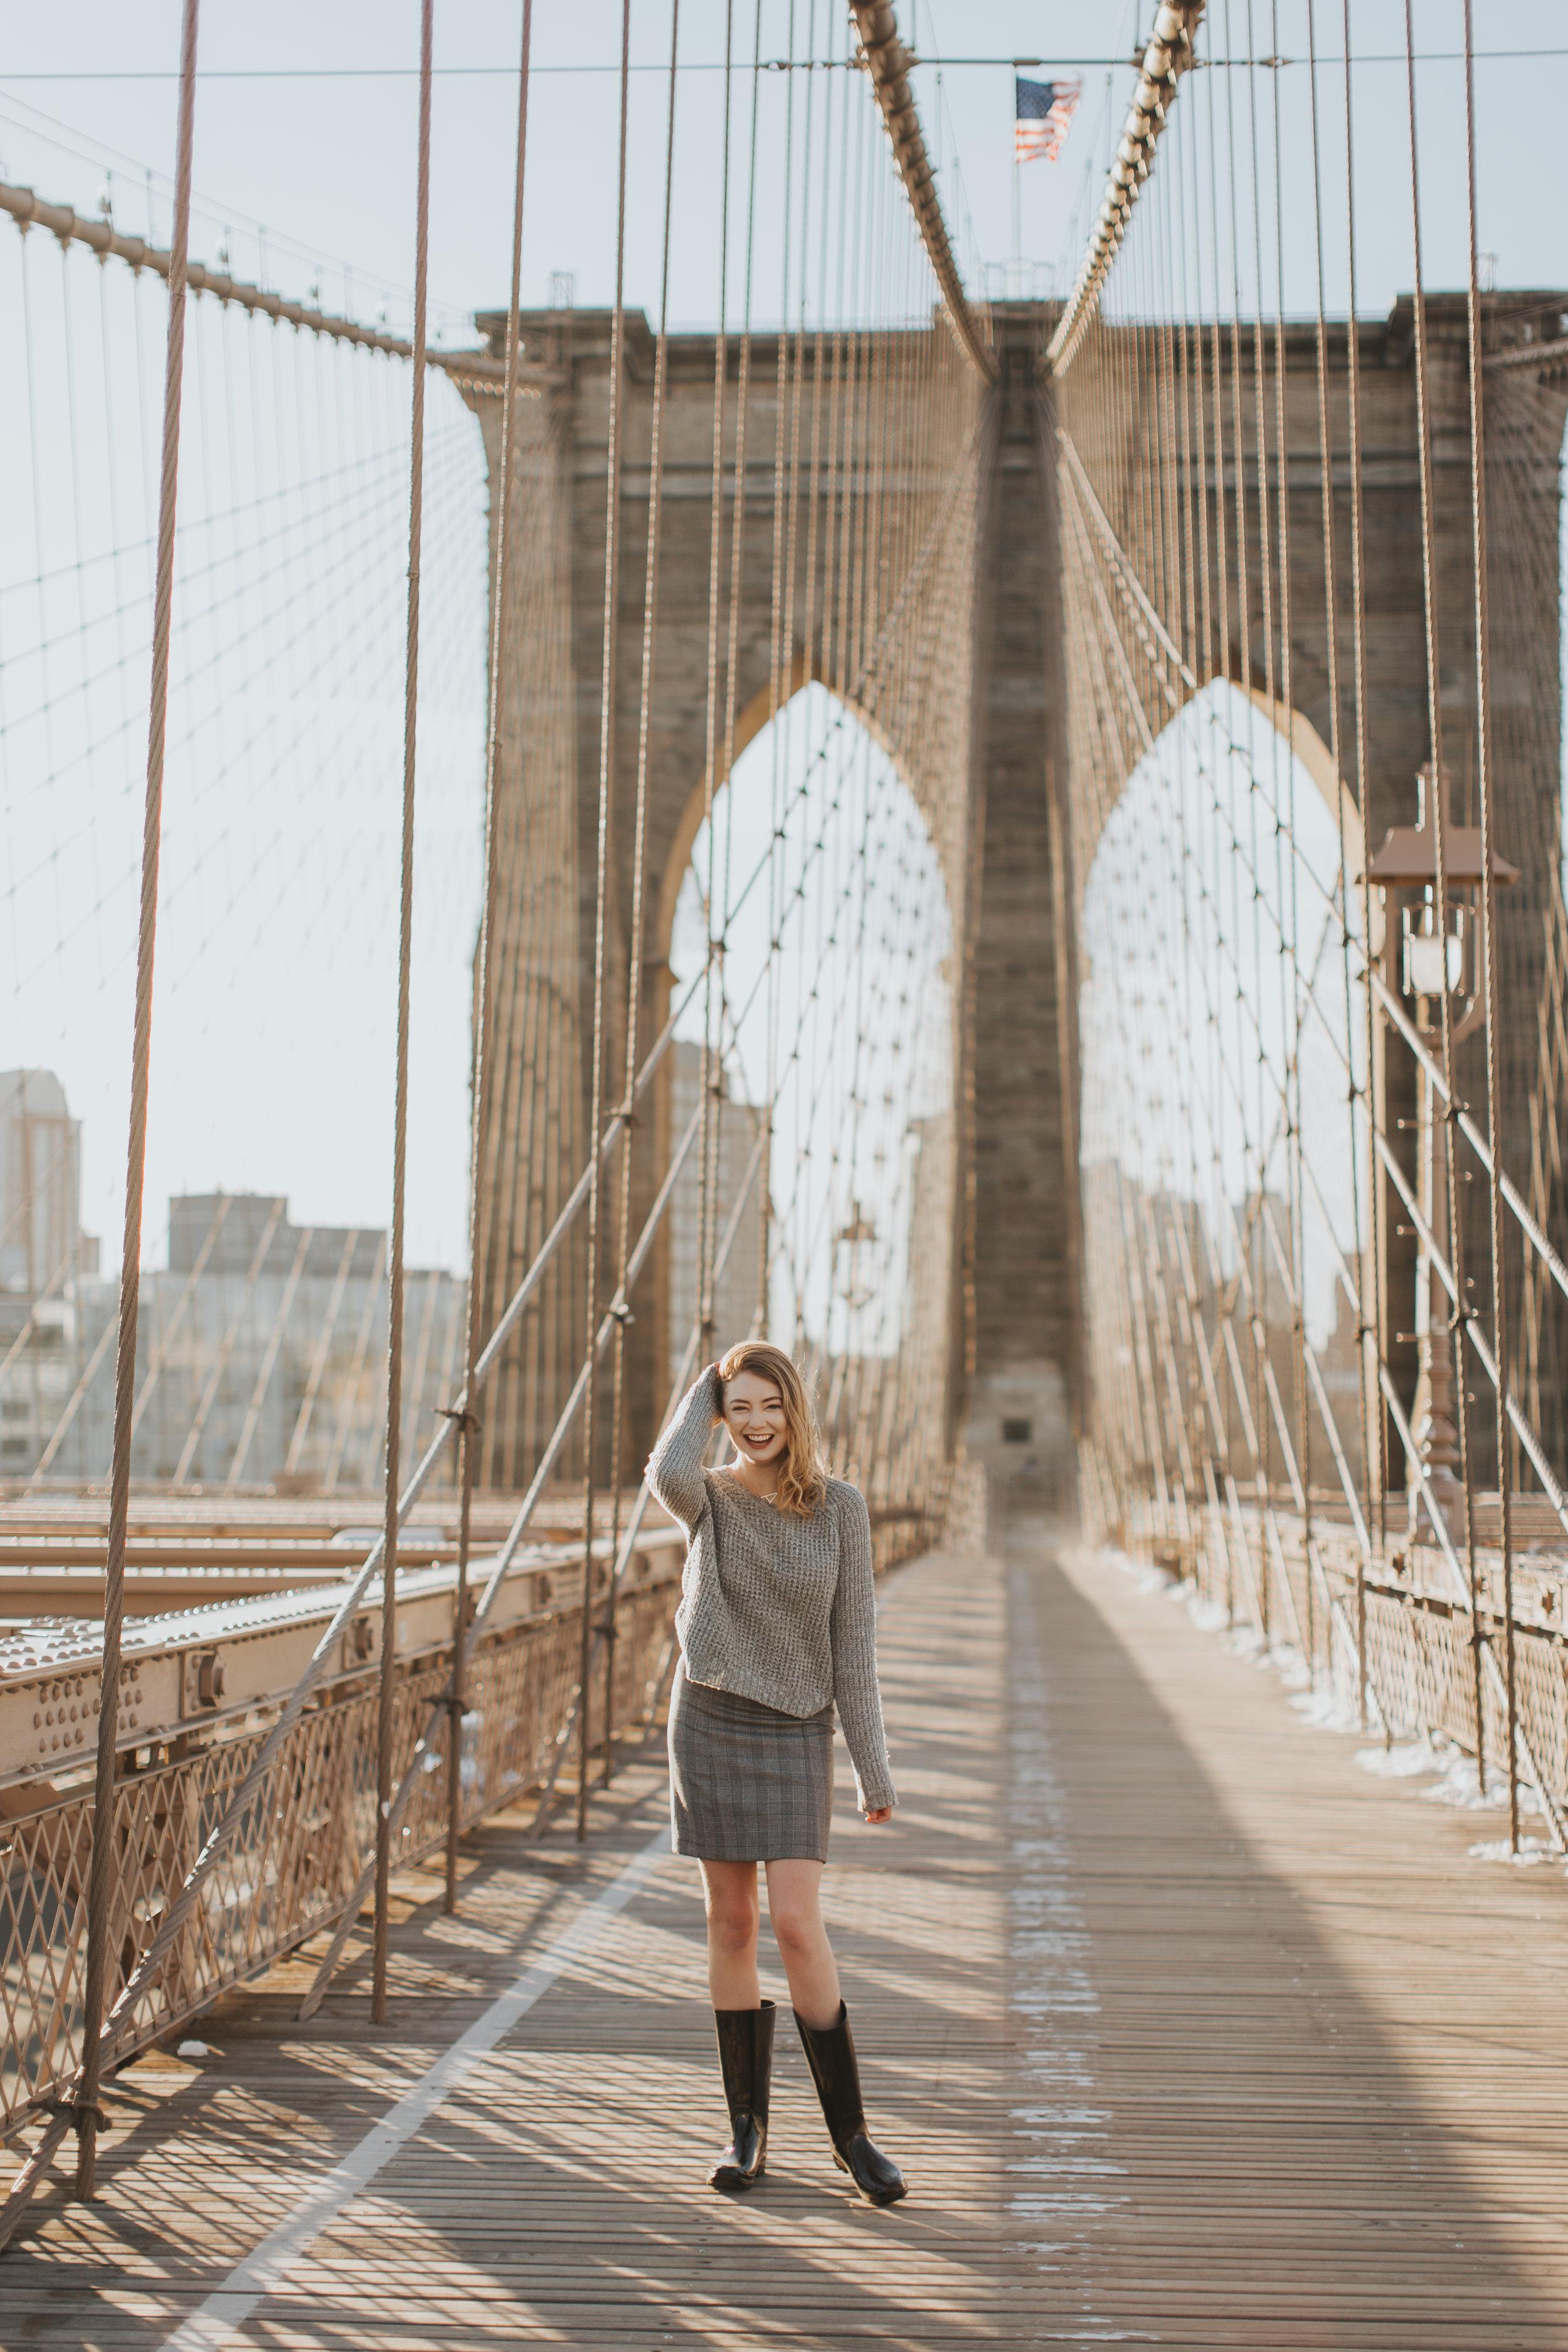 New York City portrait photographer, New york city wedding photographer, Brooklyn bridge portrait, brooklyn bridge photos, brooklyn bridge sunrise session, Brooklyn bridge inspiration521.JPG